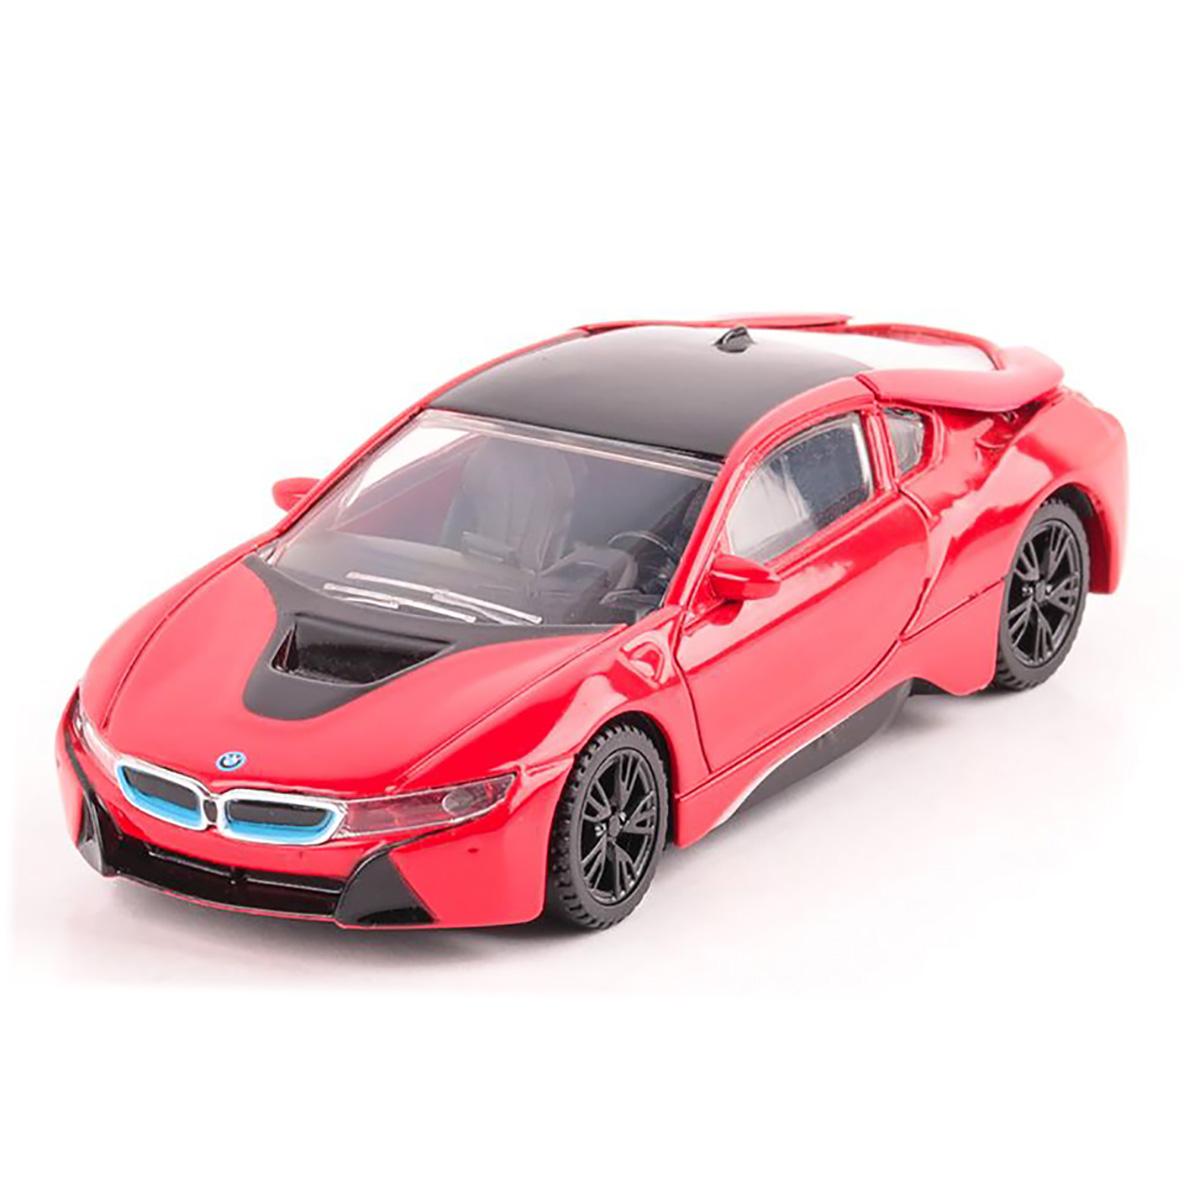 Masinuta Rastar BMW I8, Rosu, 1:43